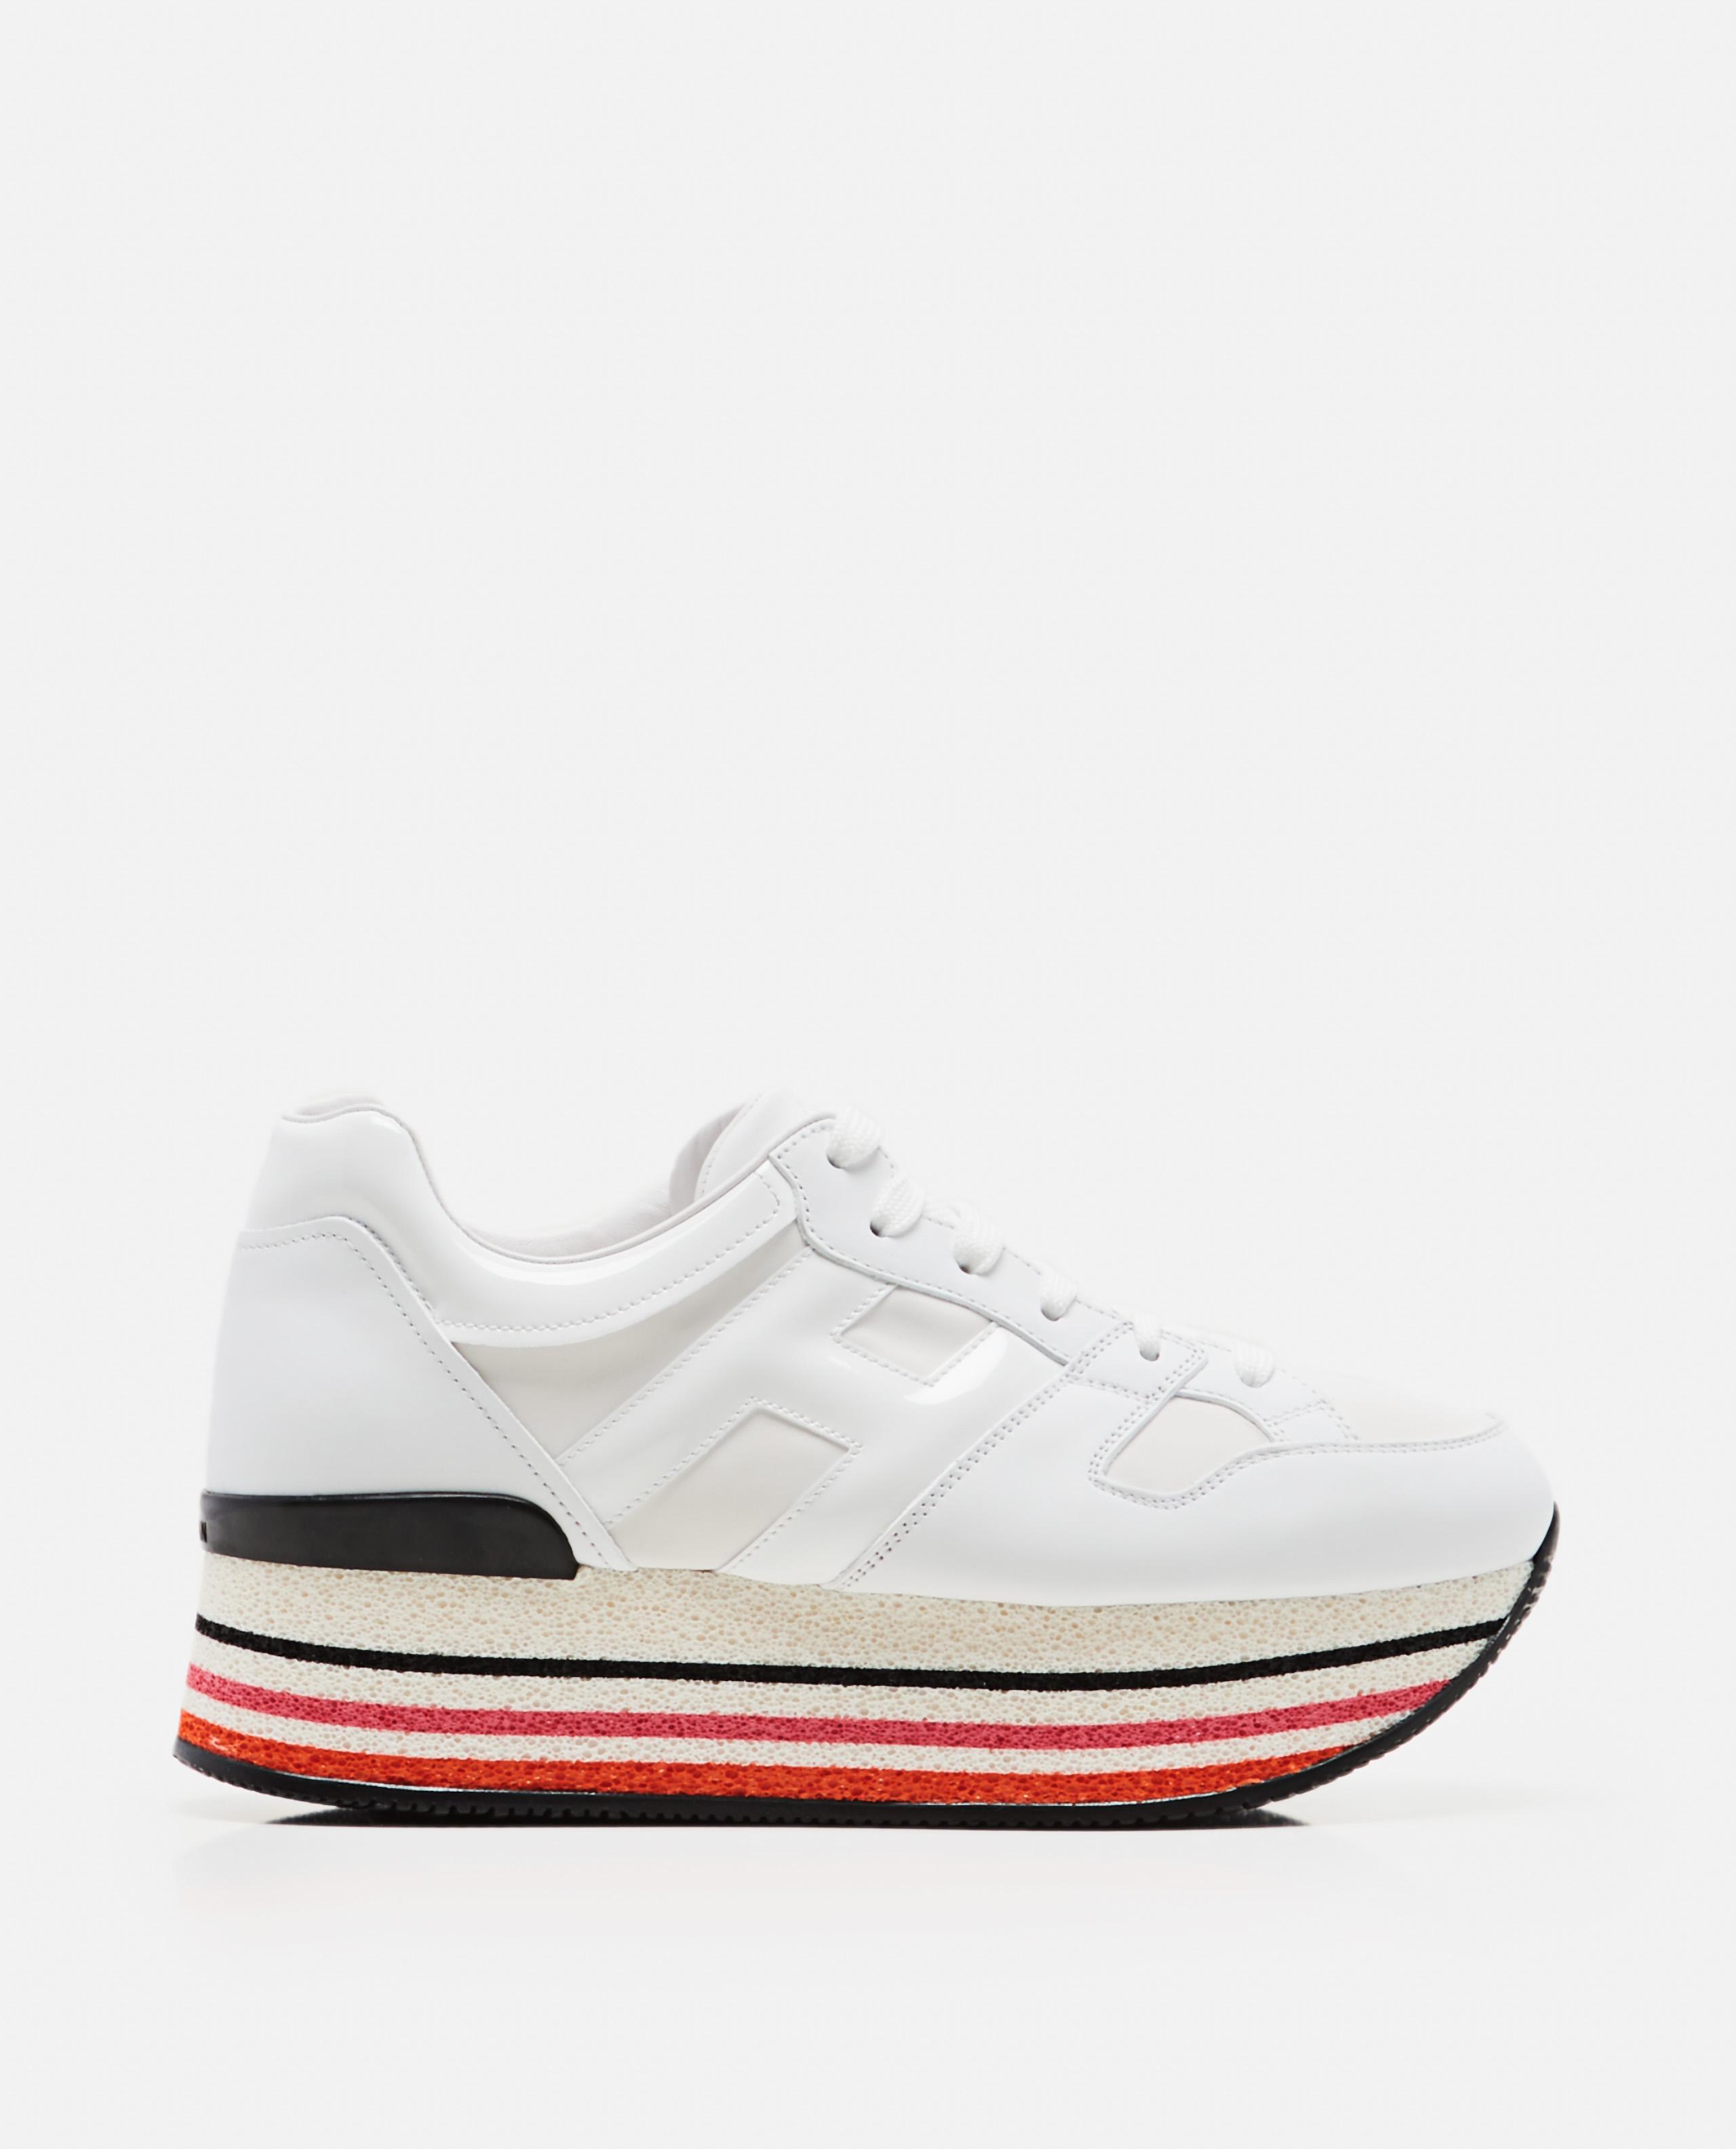 Maxi H222 Hogan sneakers